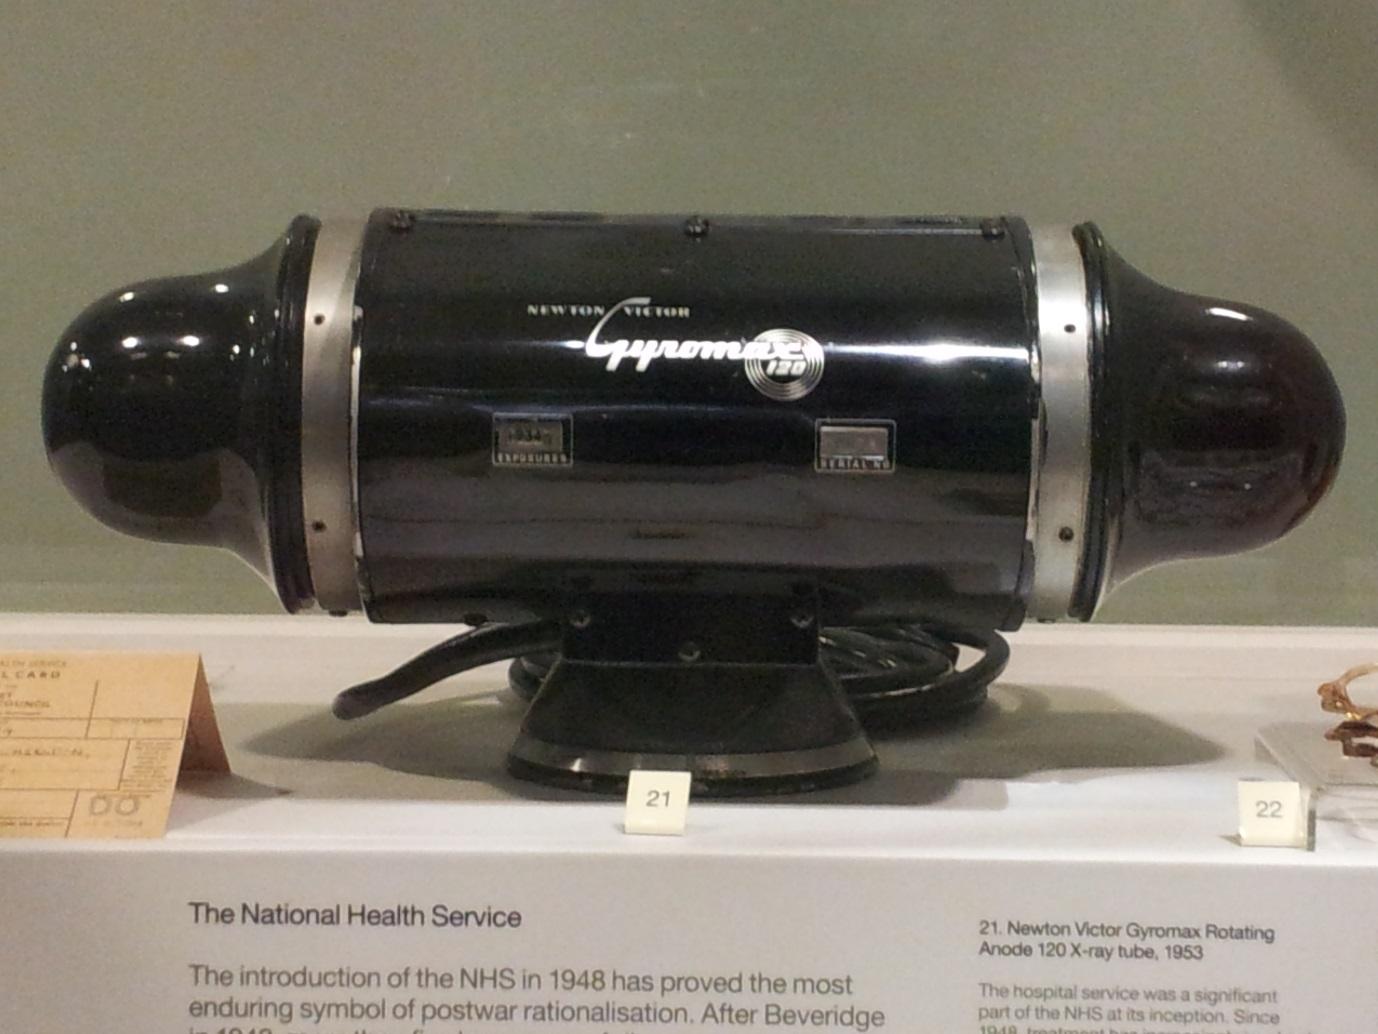 Newton Victor Gyromax Rotating Anode 120 X-ray tube